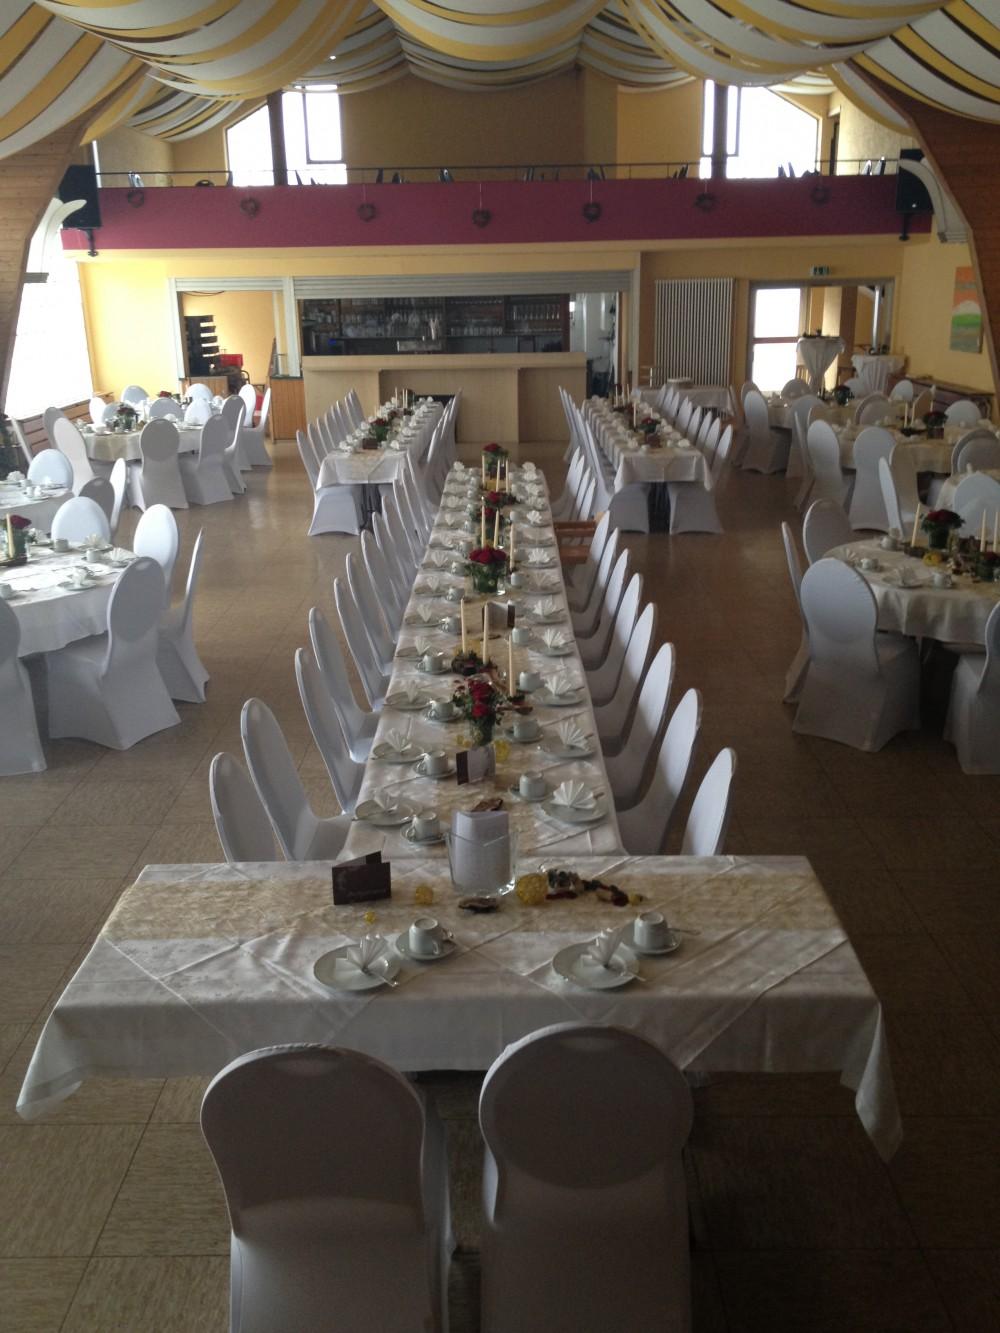 Restaurant Fallerhof in Bad Krozingen-Hausen